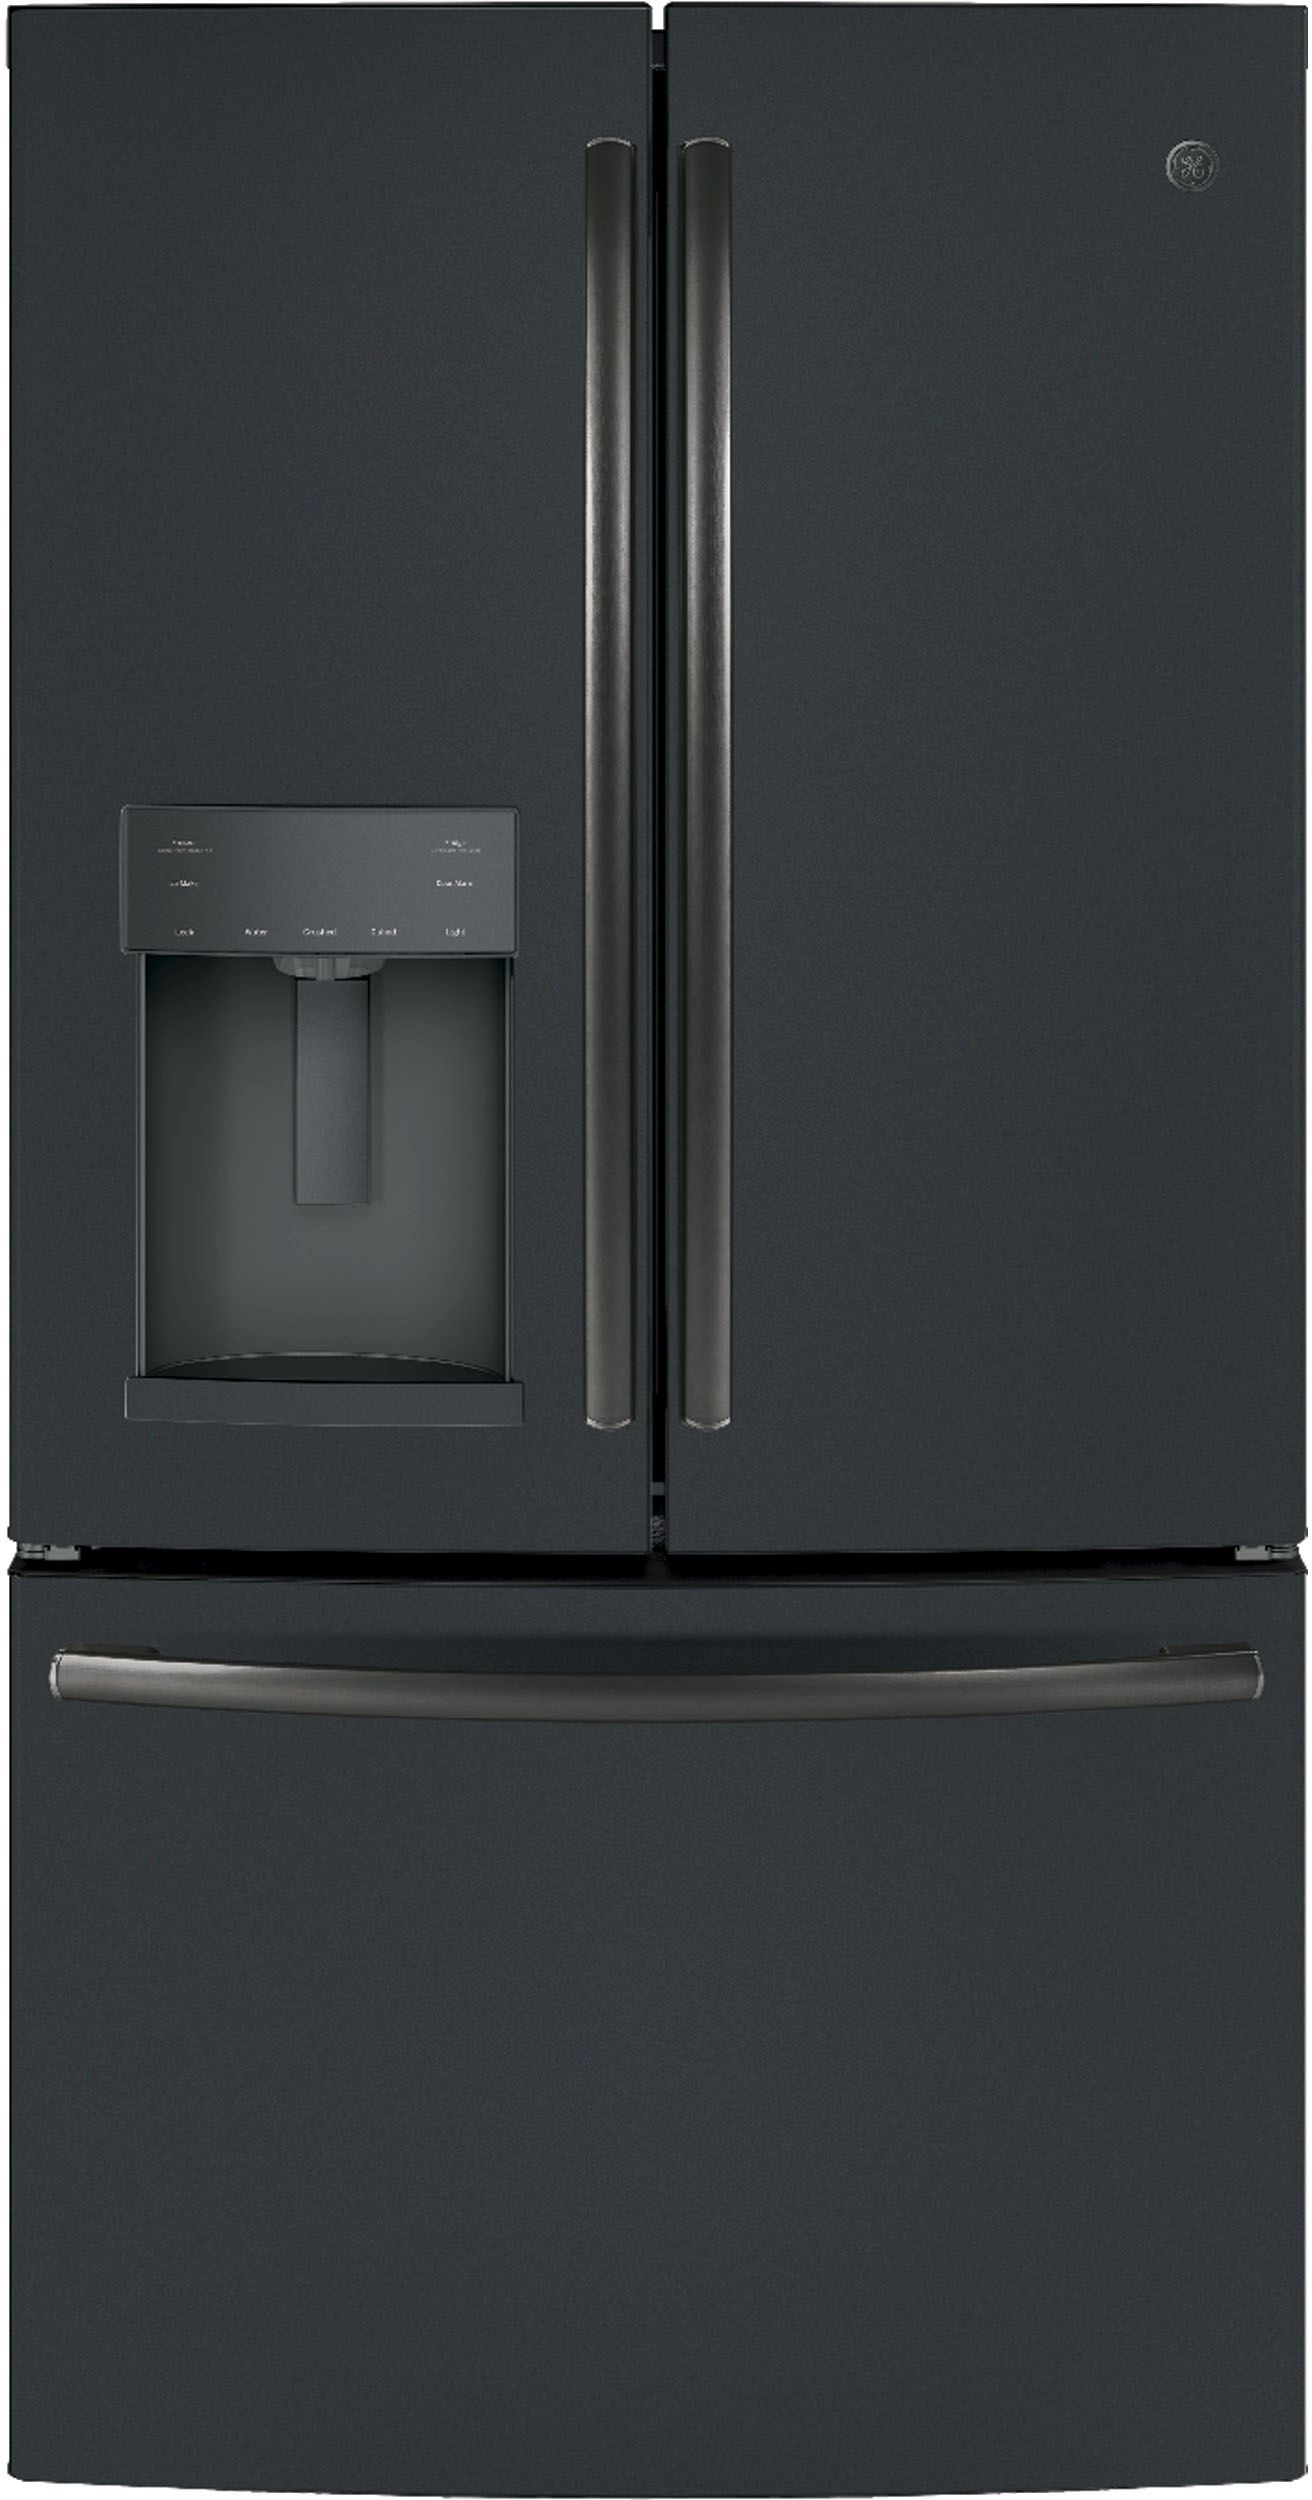 278 cu ft french door refrigerator black slate gfd28gelds ft french door refrigerator black slate gfd28gelds rubansaba